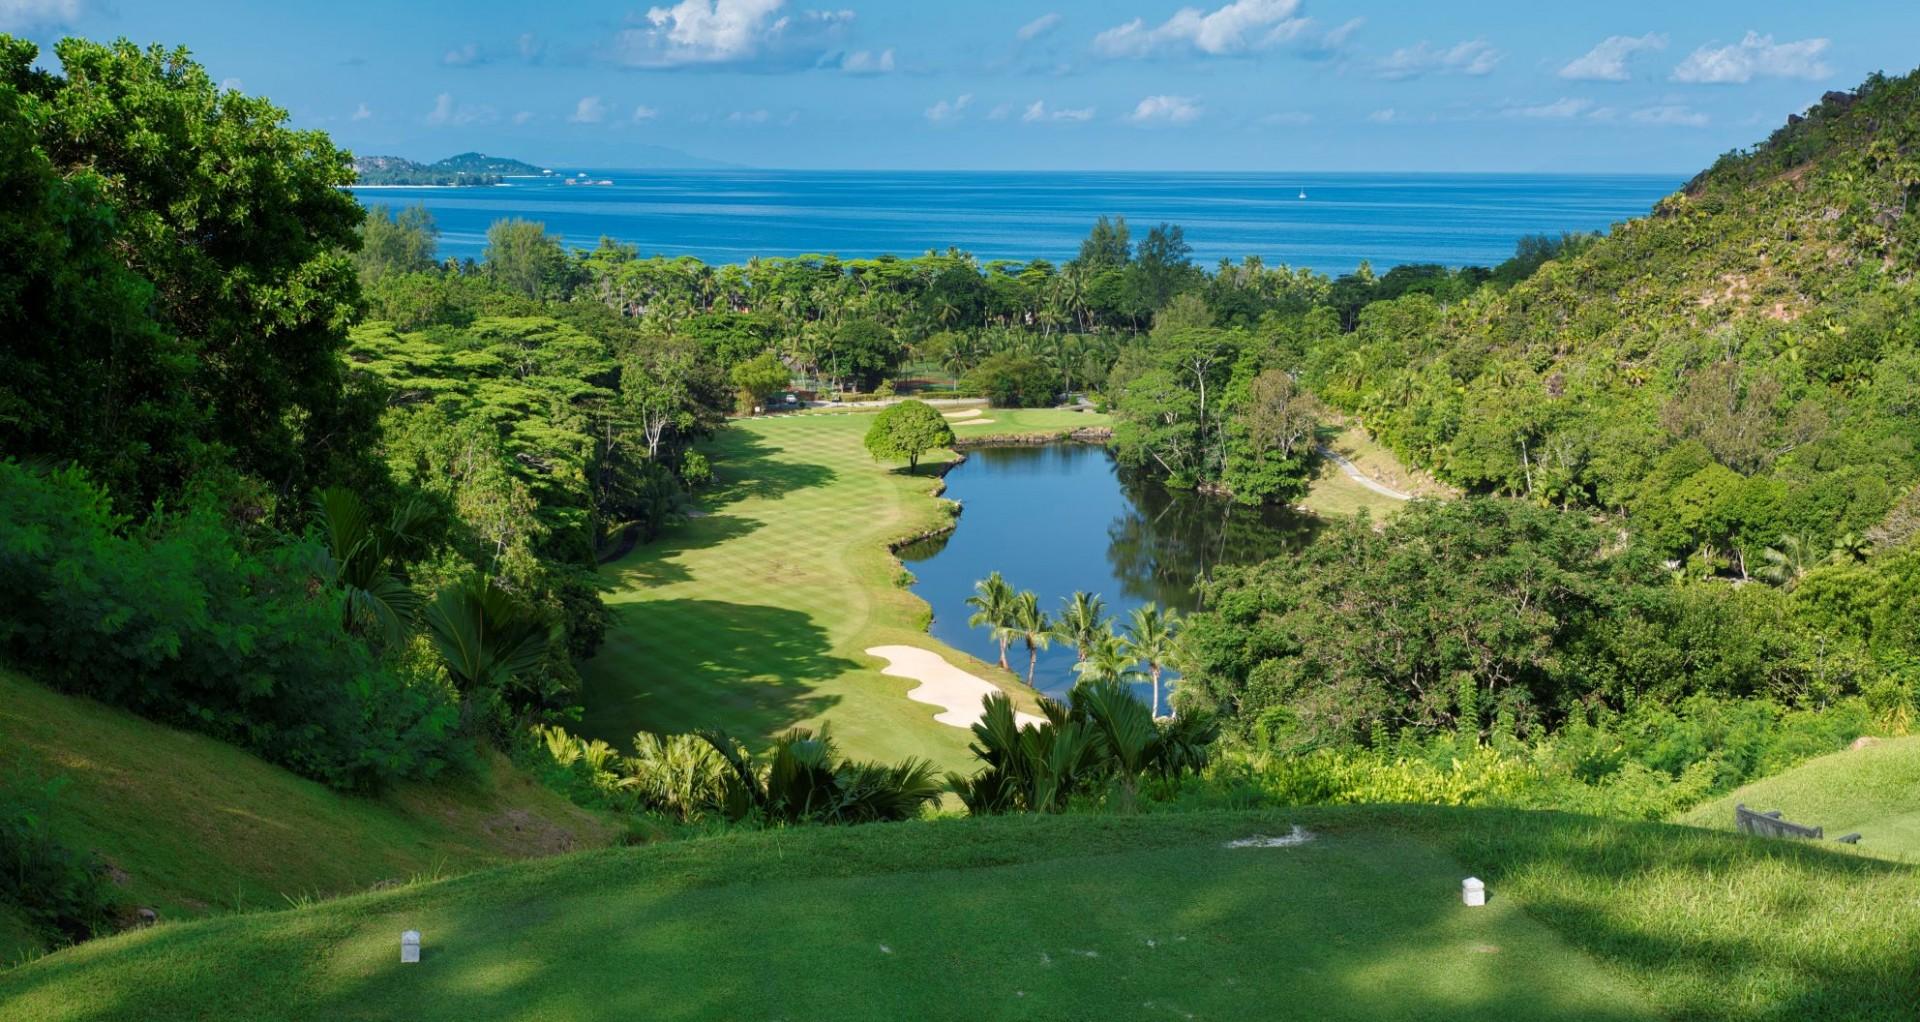 lemuria-seychelles-2019-jt-golf-22_hd1